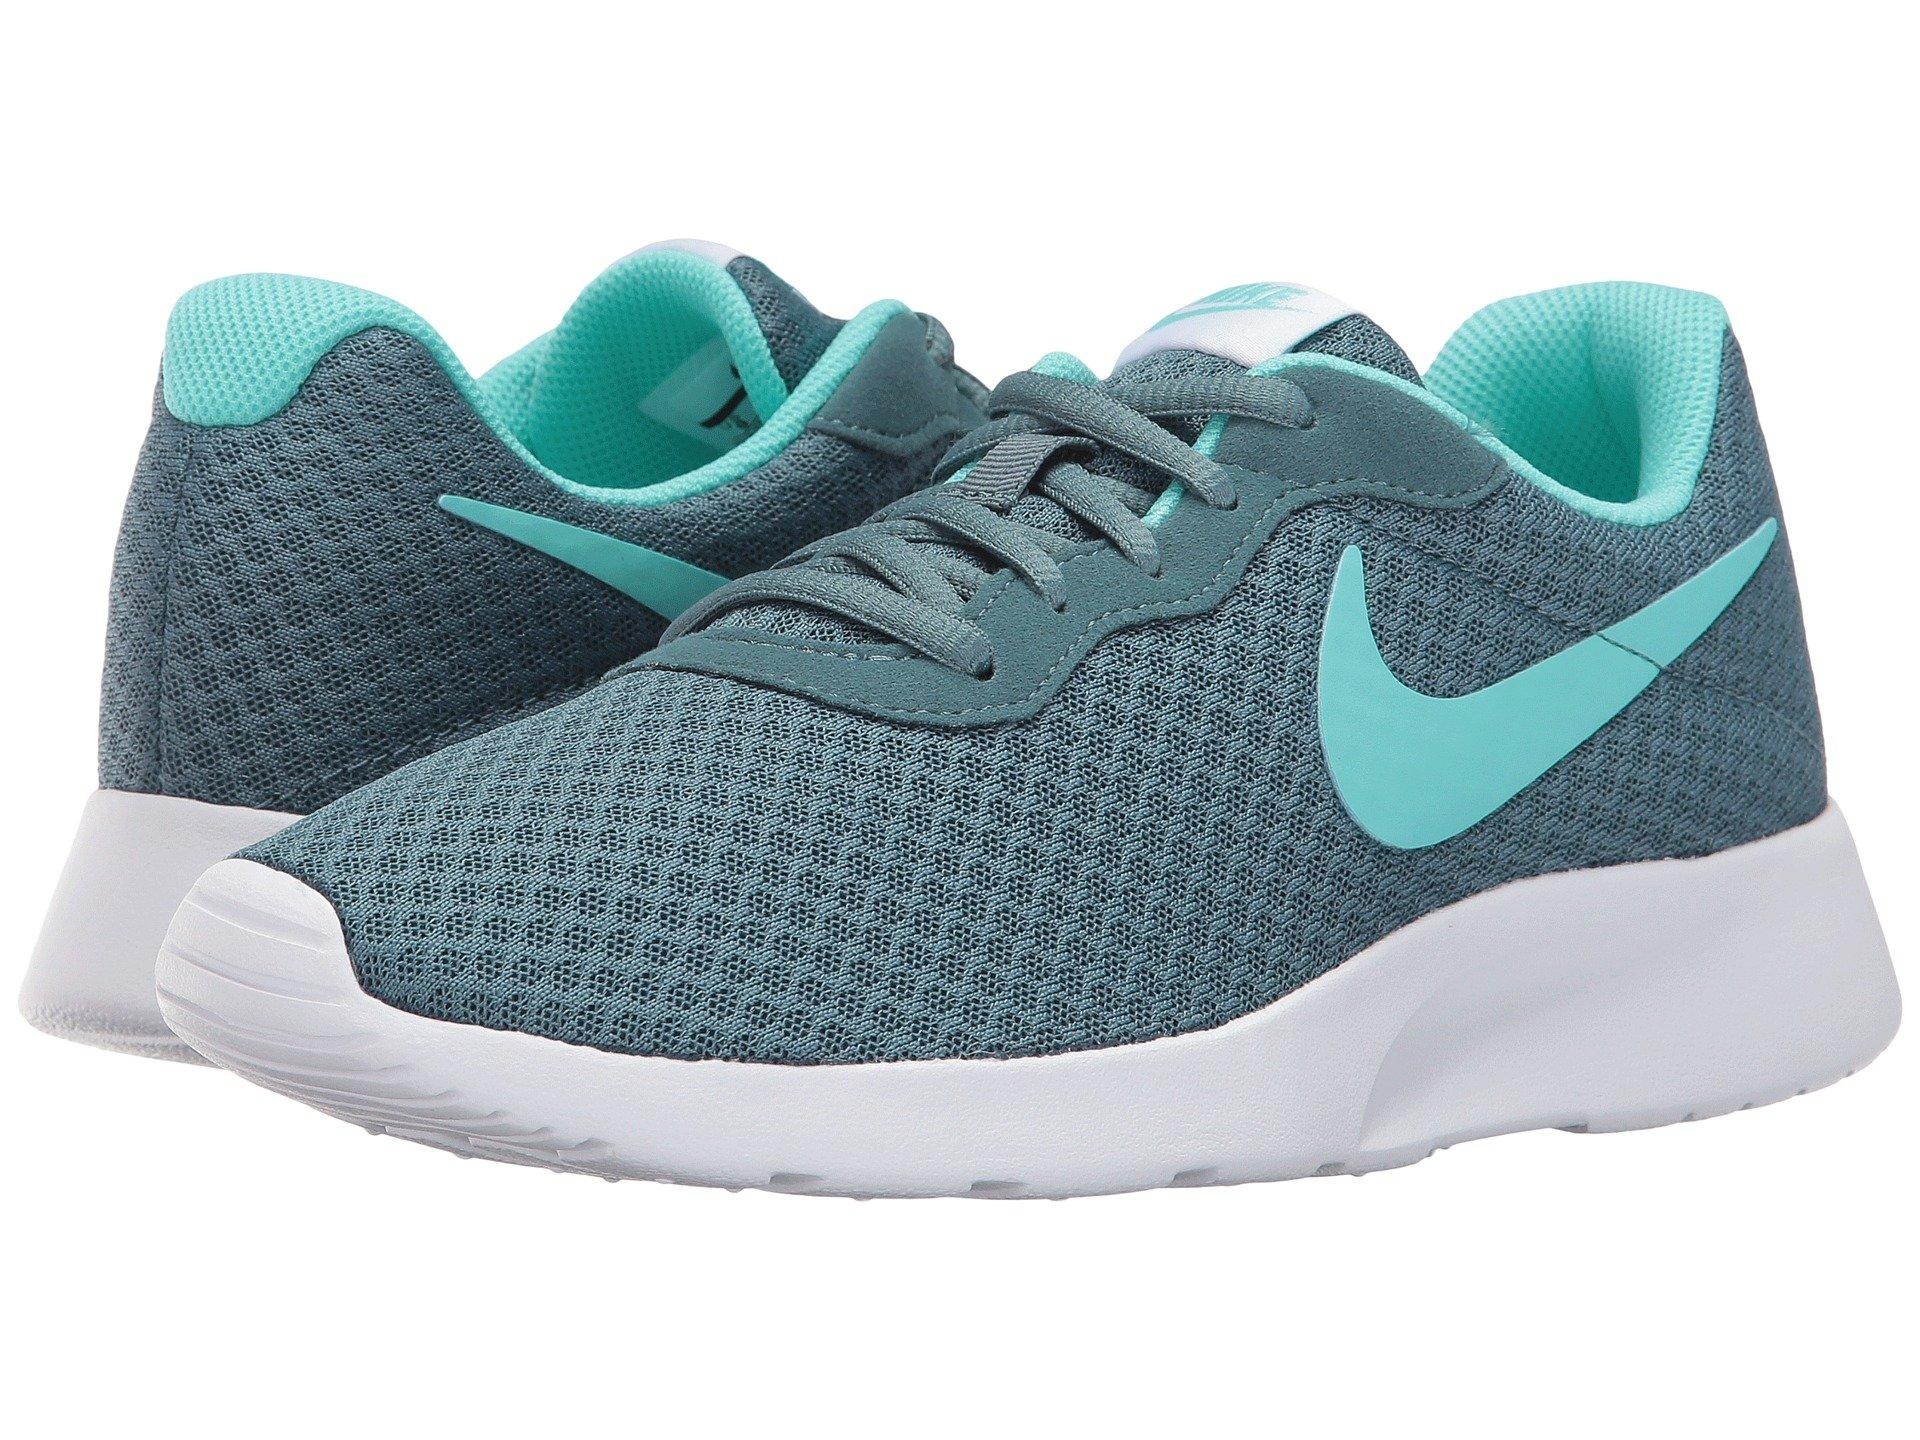 c1ef99158b36 Nike Tanjun In Iced Jade Aurora Green White